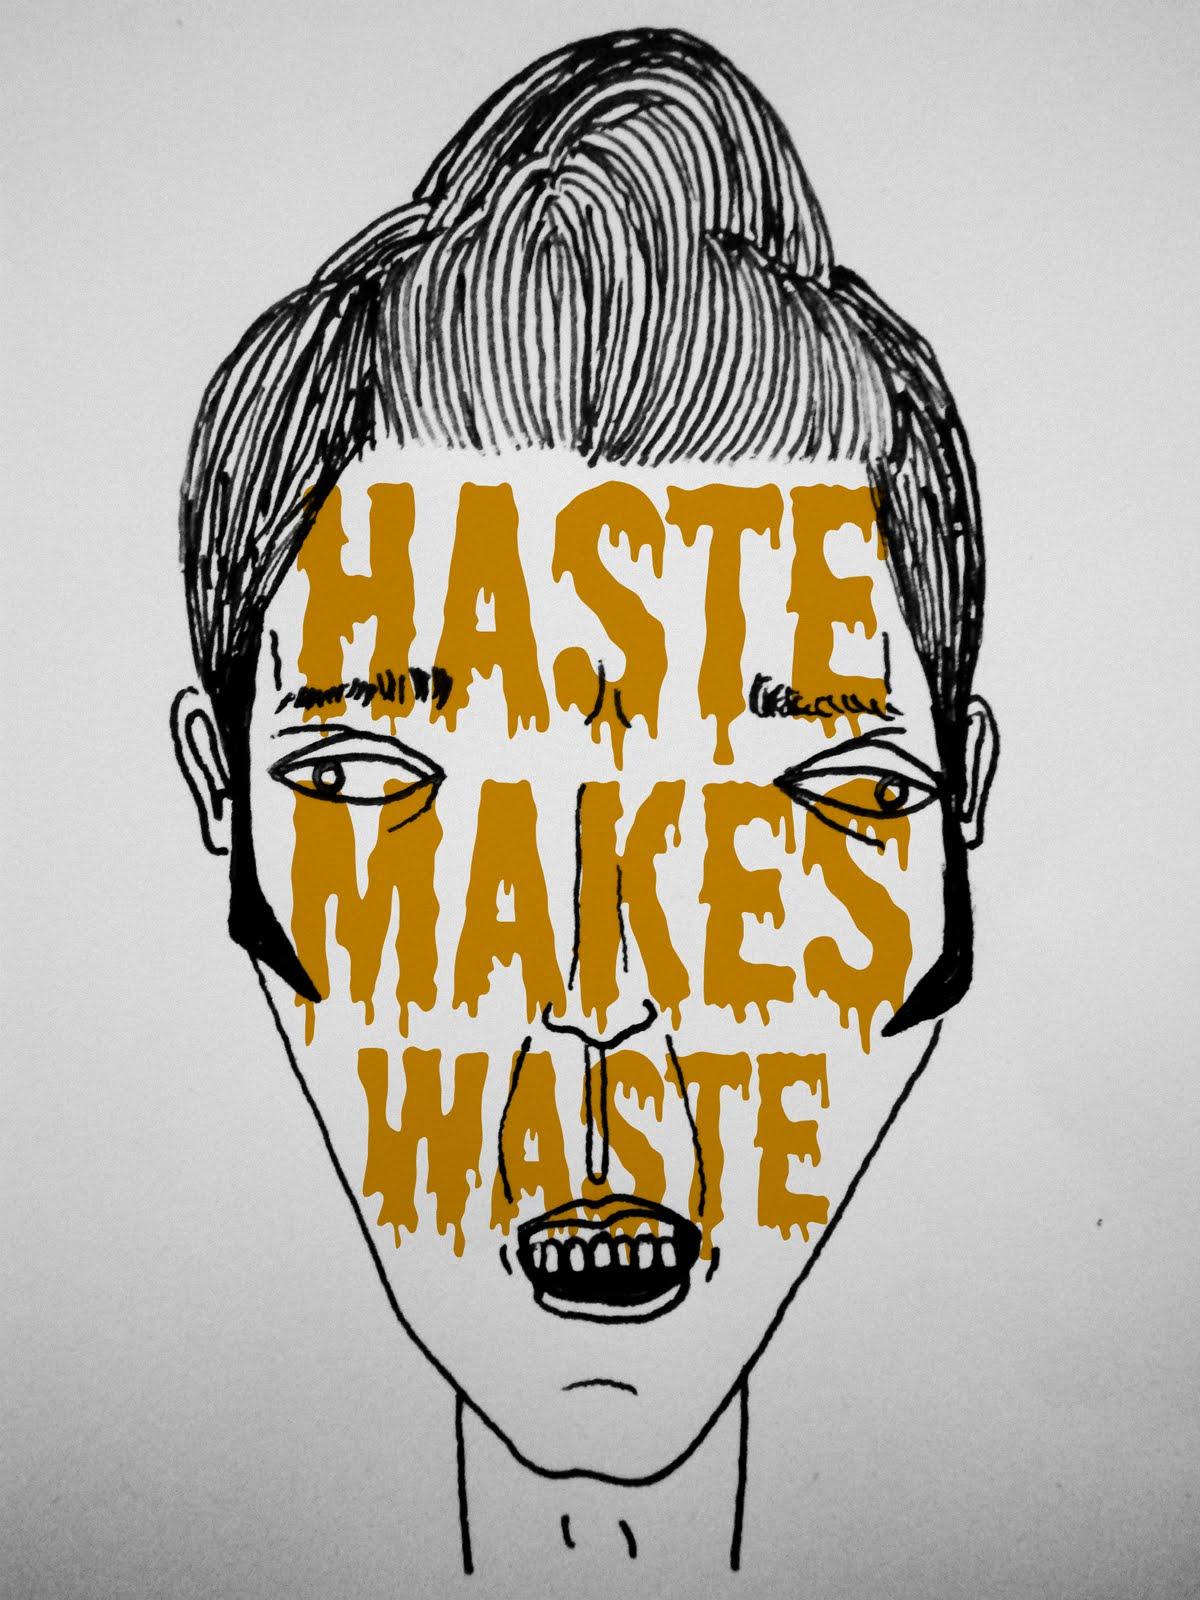 essay on haste is waste